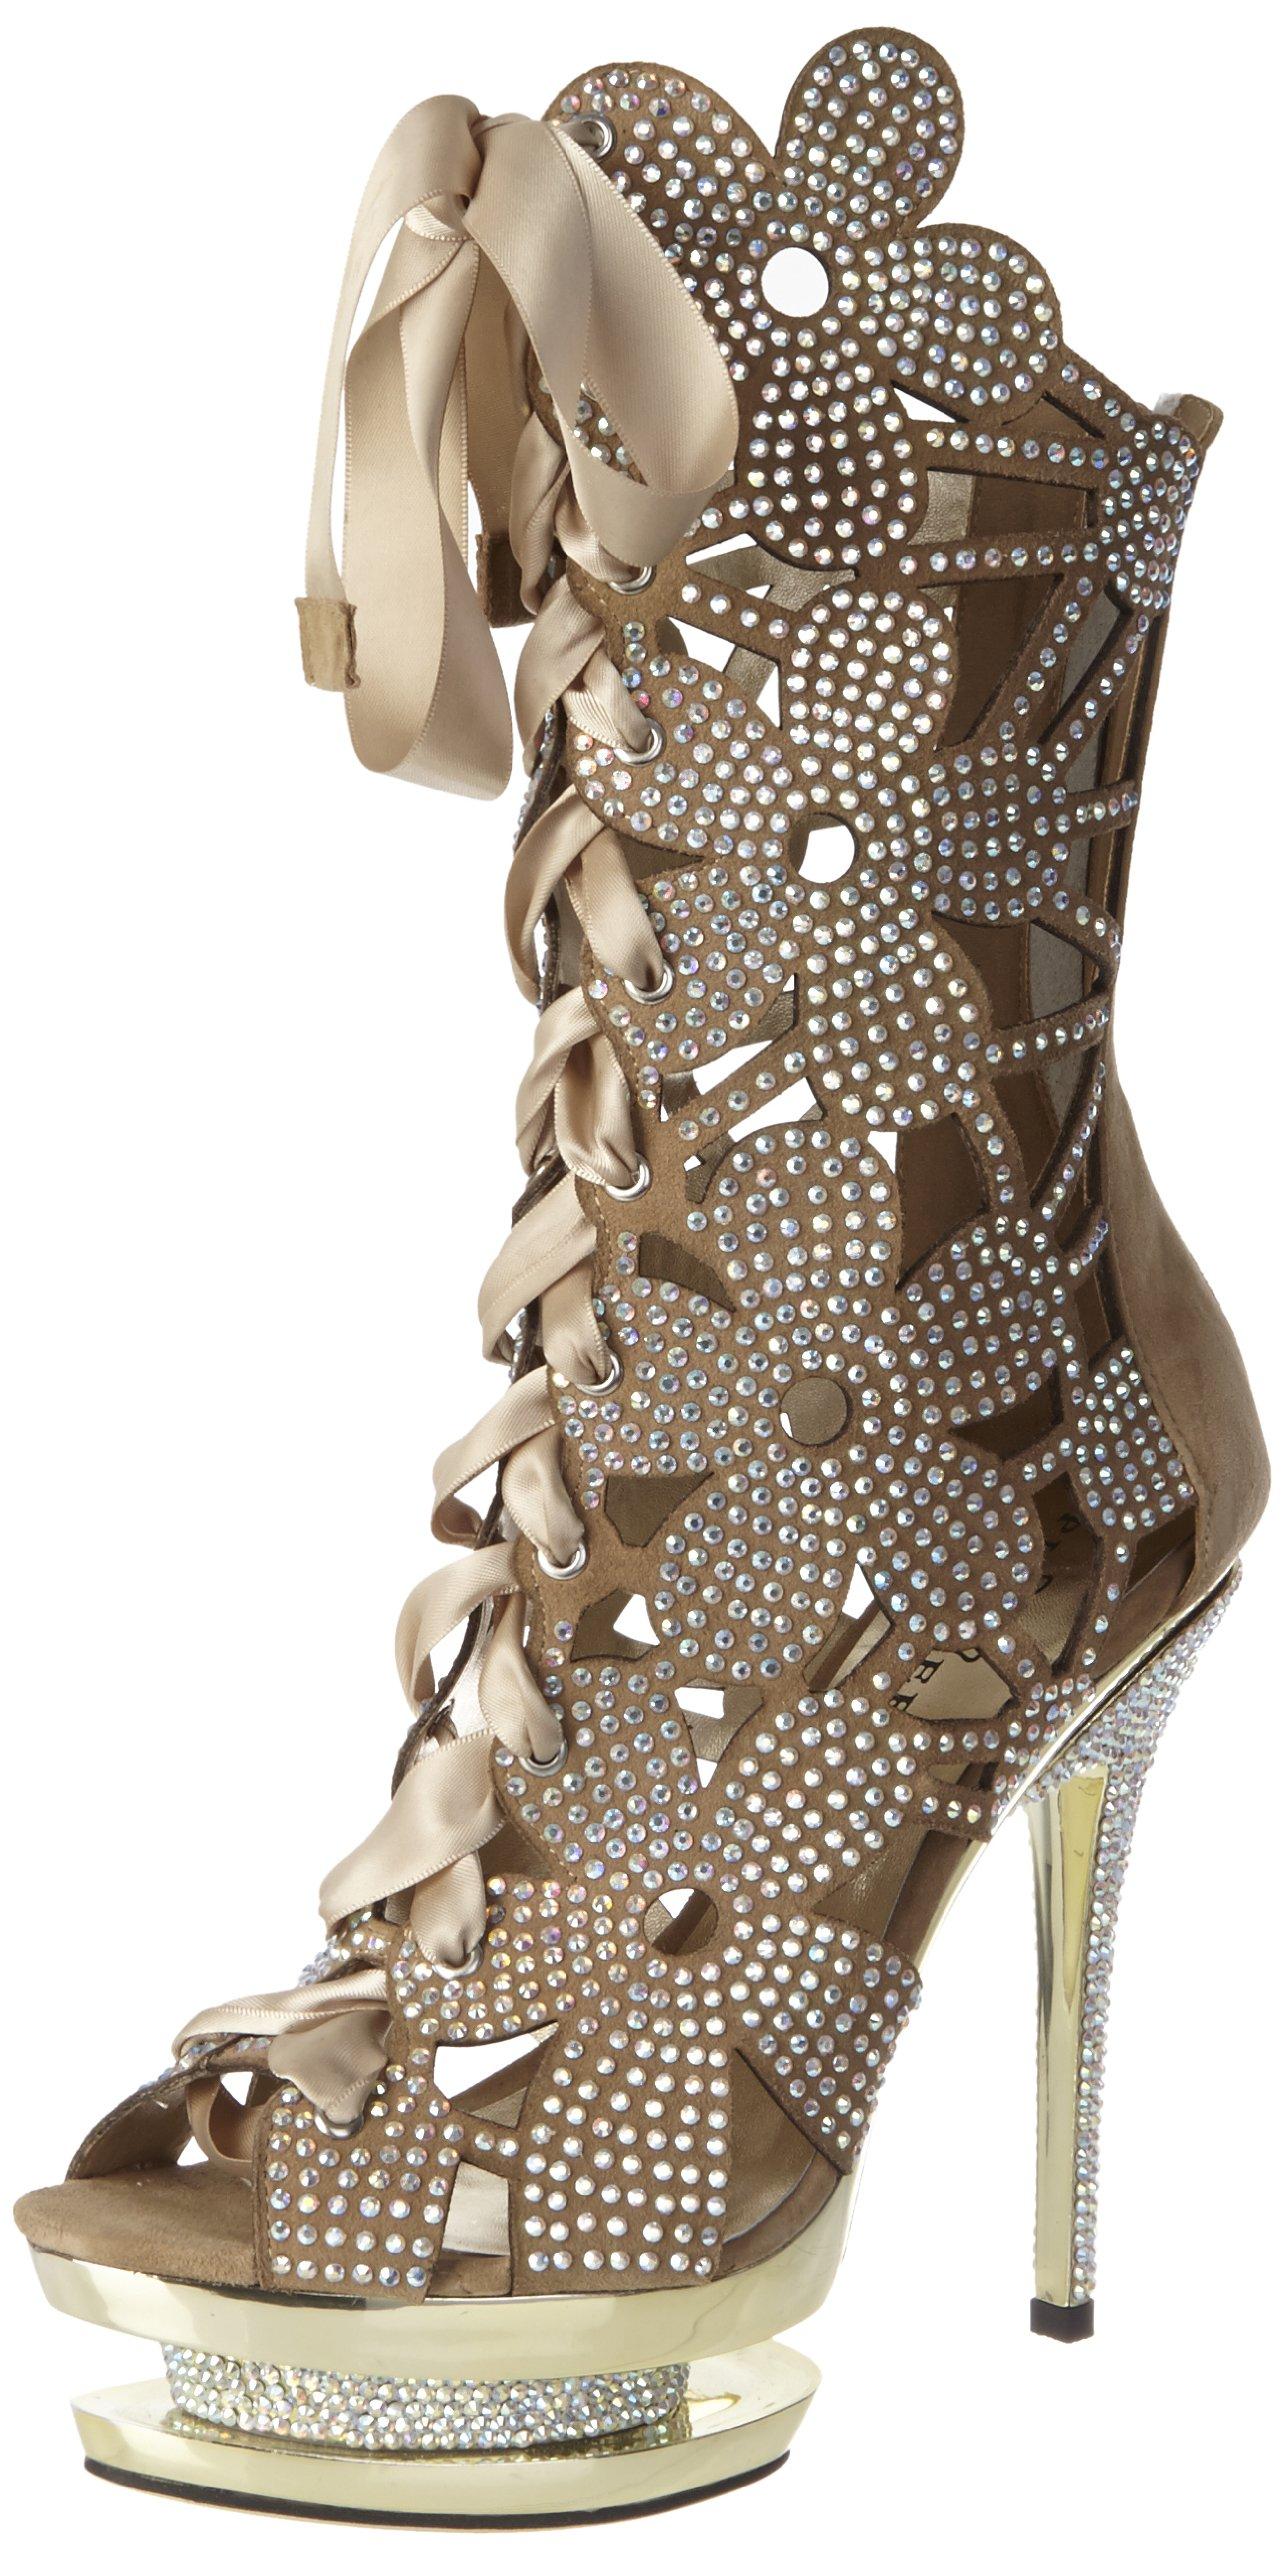 Pleaser Women's Fantasia-1020 Platform Sandal,Blush Suede/Gold Chrome,8 M US